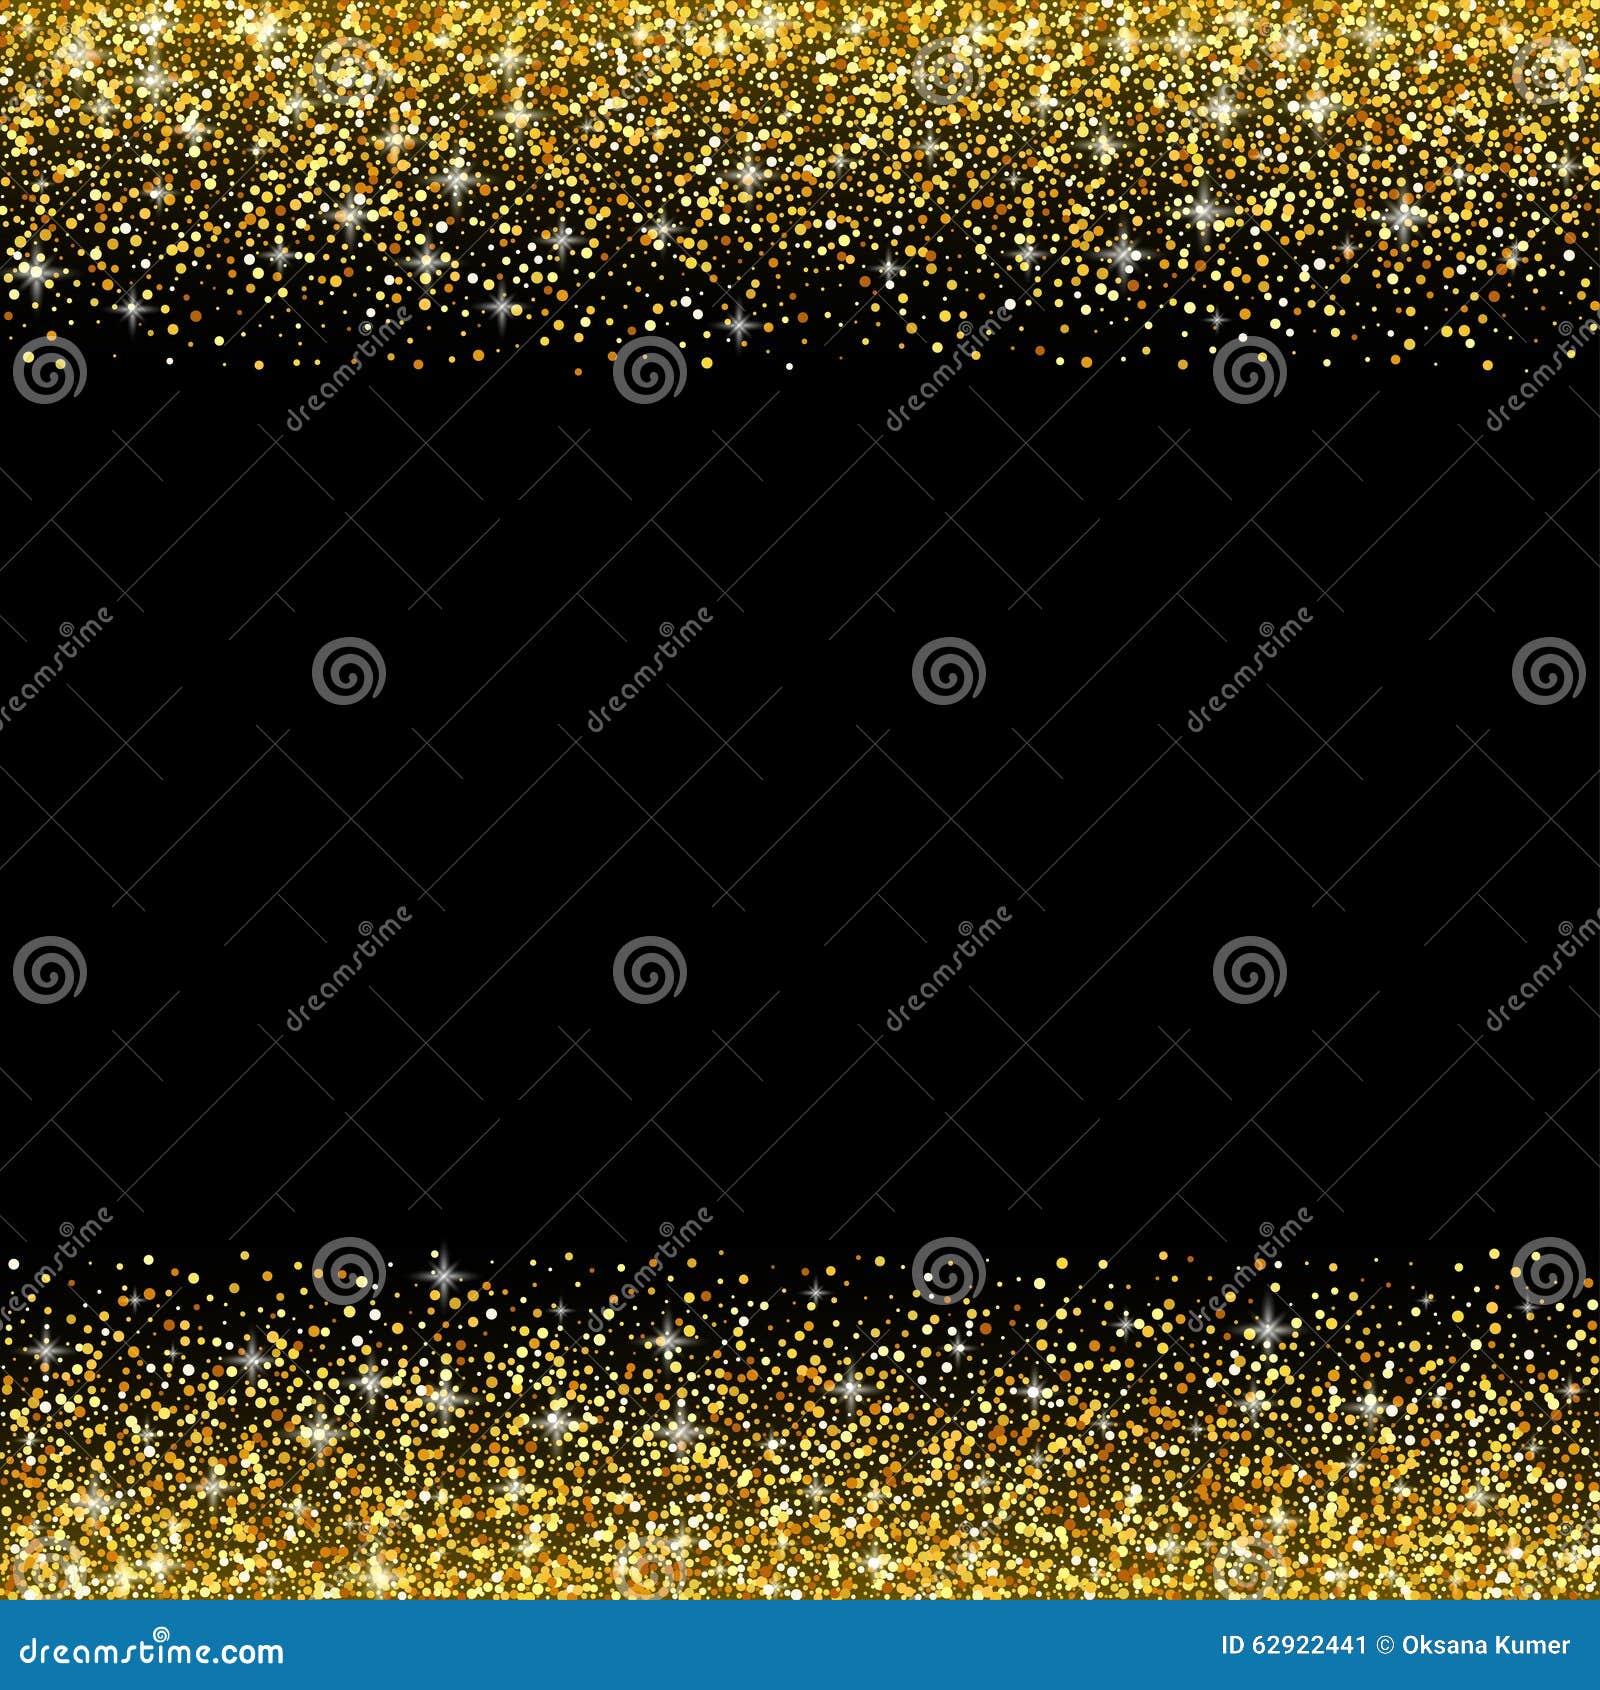 vector black background with gold glitter sparkle illustration